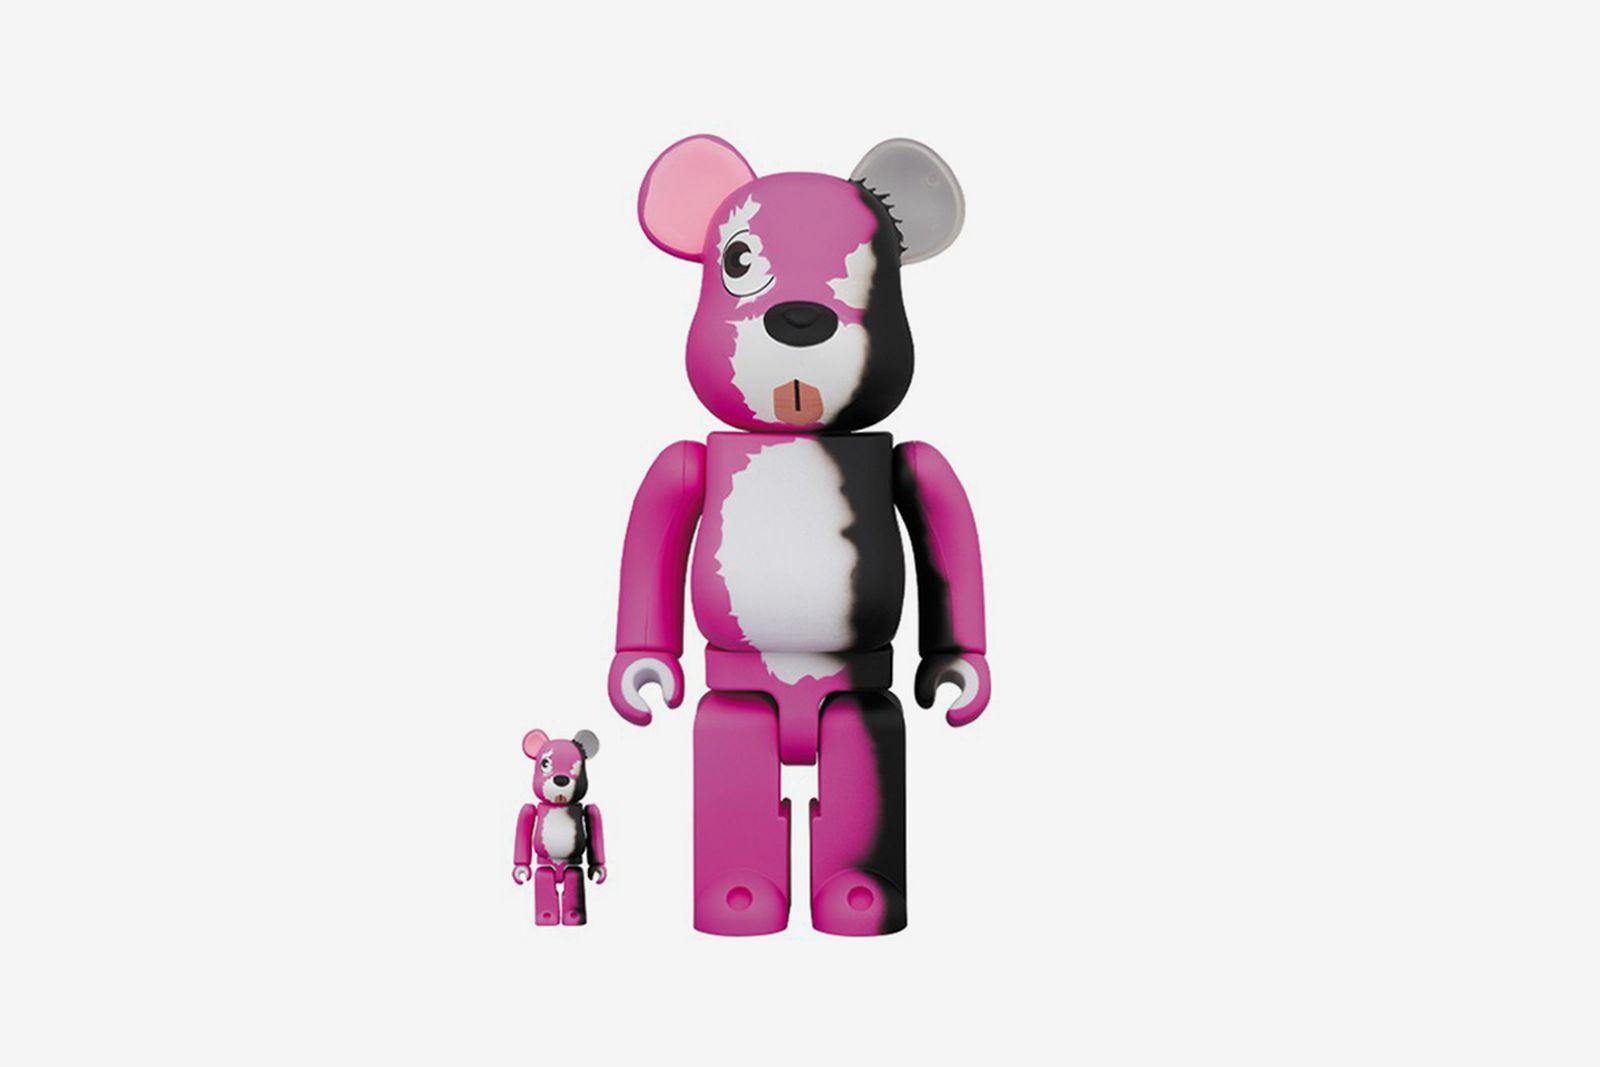 Medicom Toy pink bear Breaking Bad Bearbrick